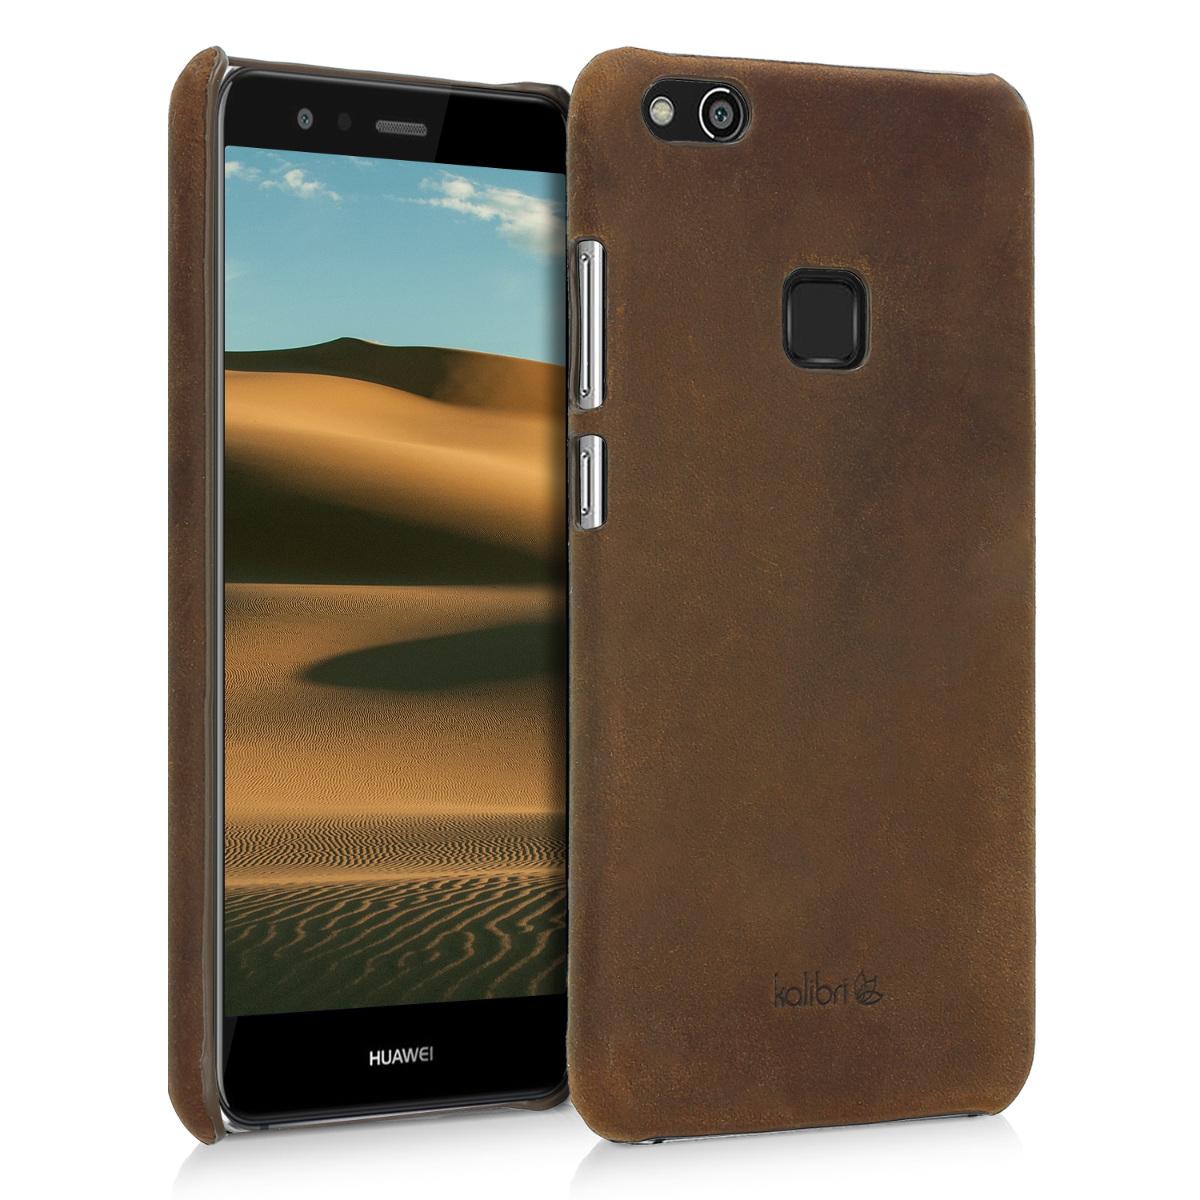 Kalibri Σκληρή Δερμάτινη Θήκη Huawei P10 Lite - Καφέ (42333.05)